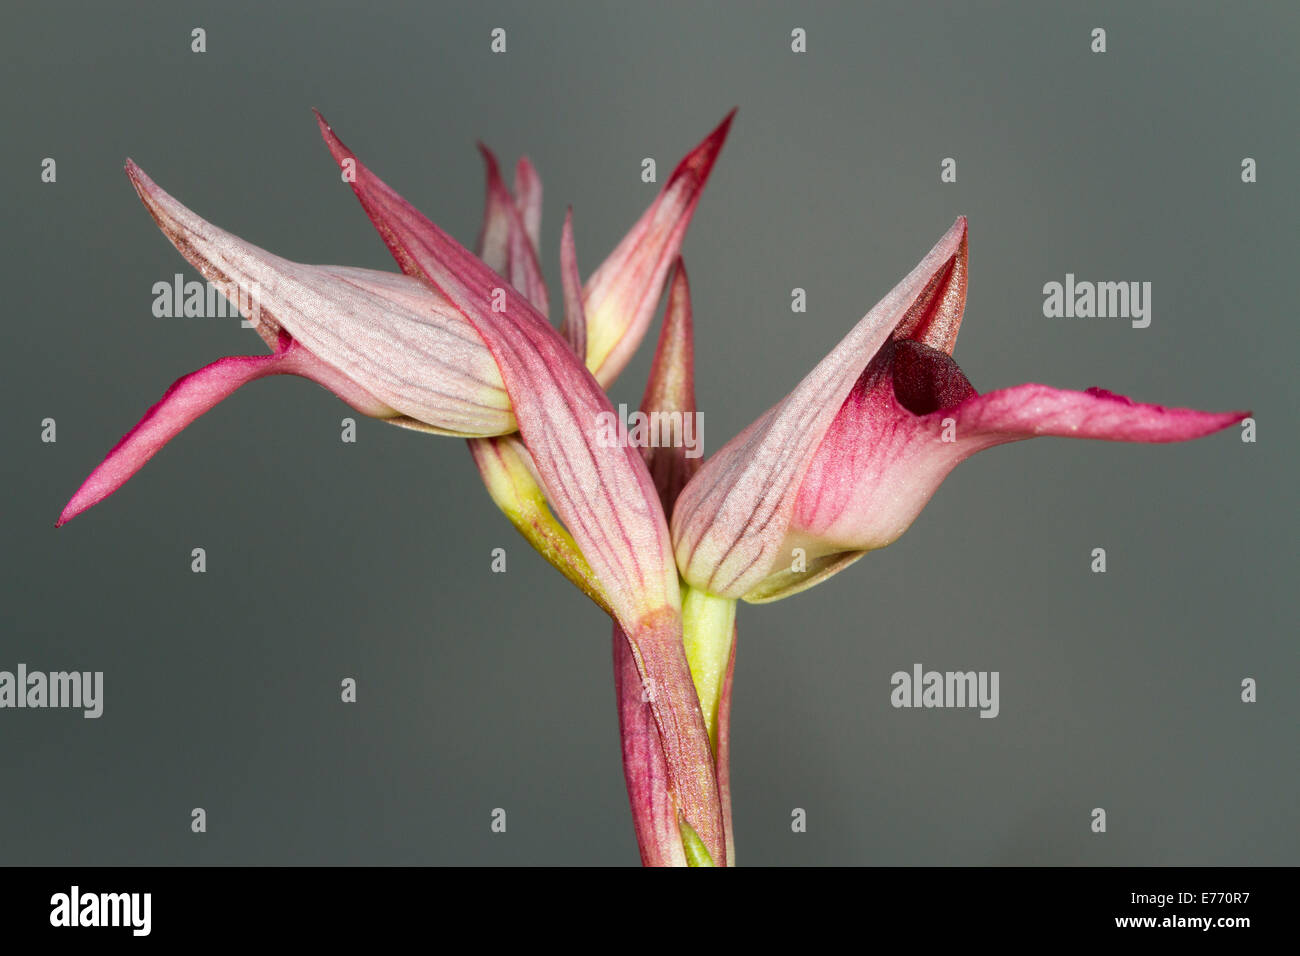 Tongue Orchid (Serapias lingua) flowering against rain clouds. Col de Calzan, Ariege Pyrenees, France. May. - Stock Image